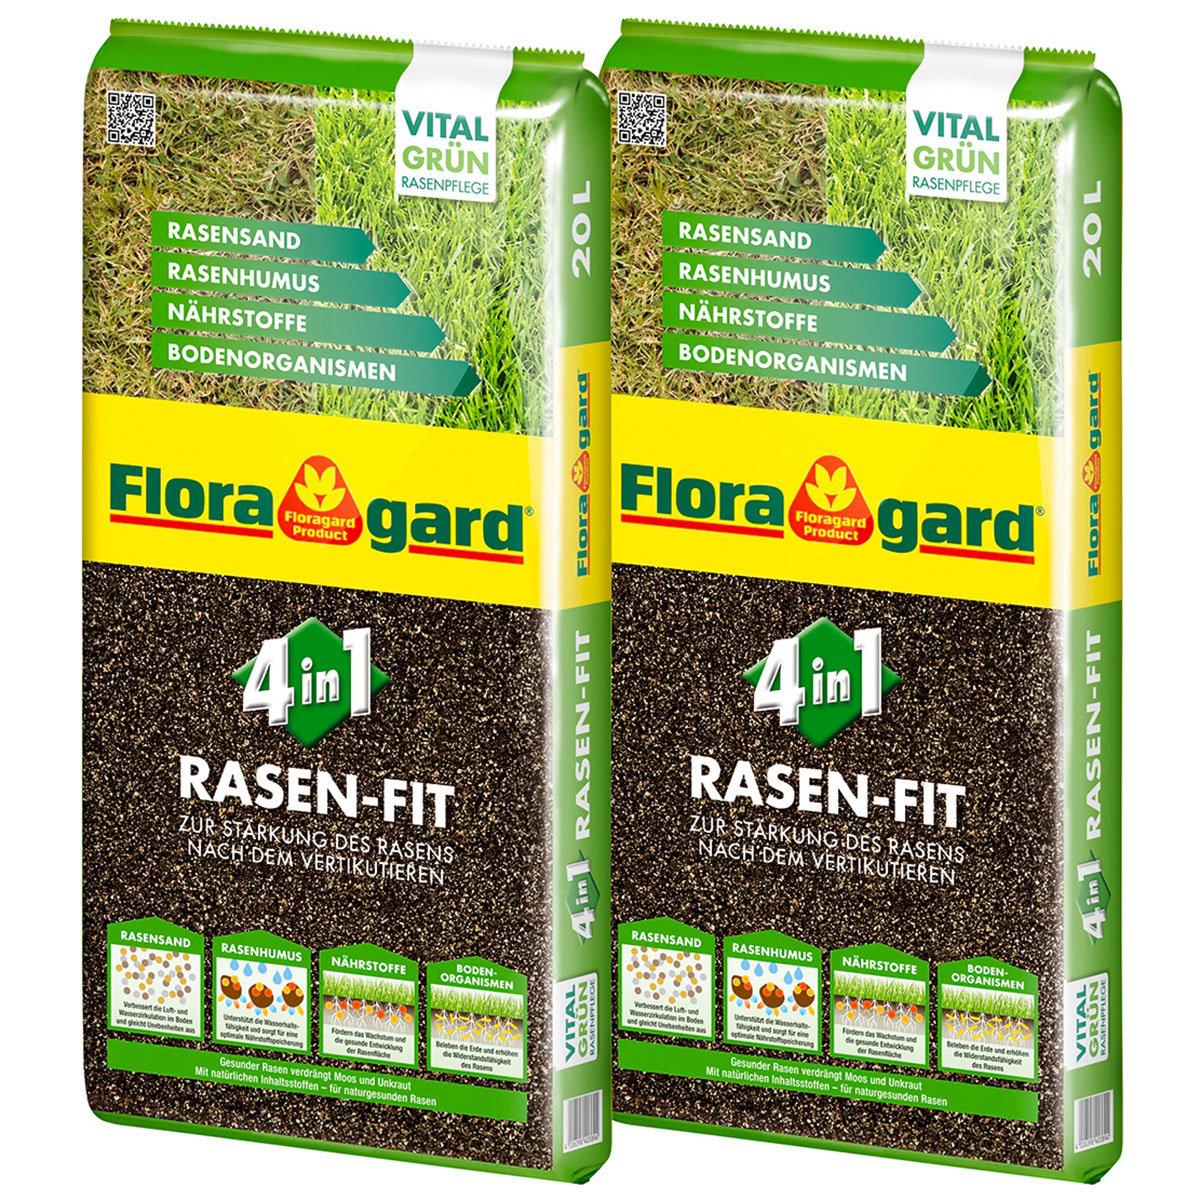 Rasenfit 4in1, 40 Liter